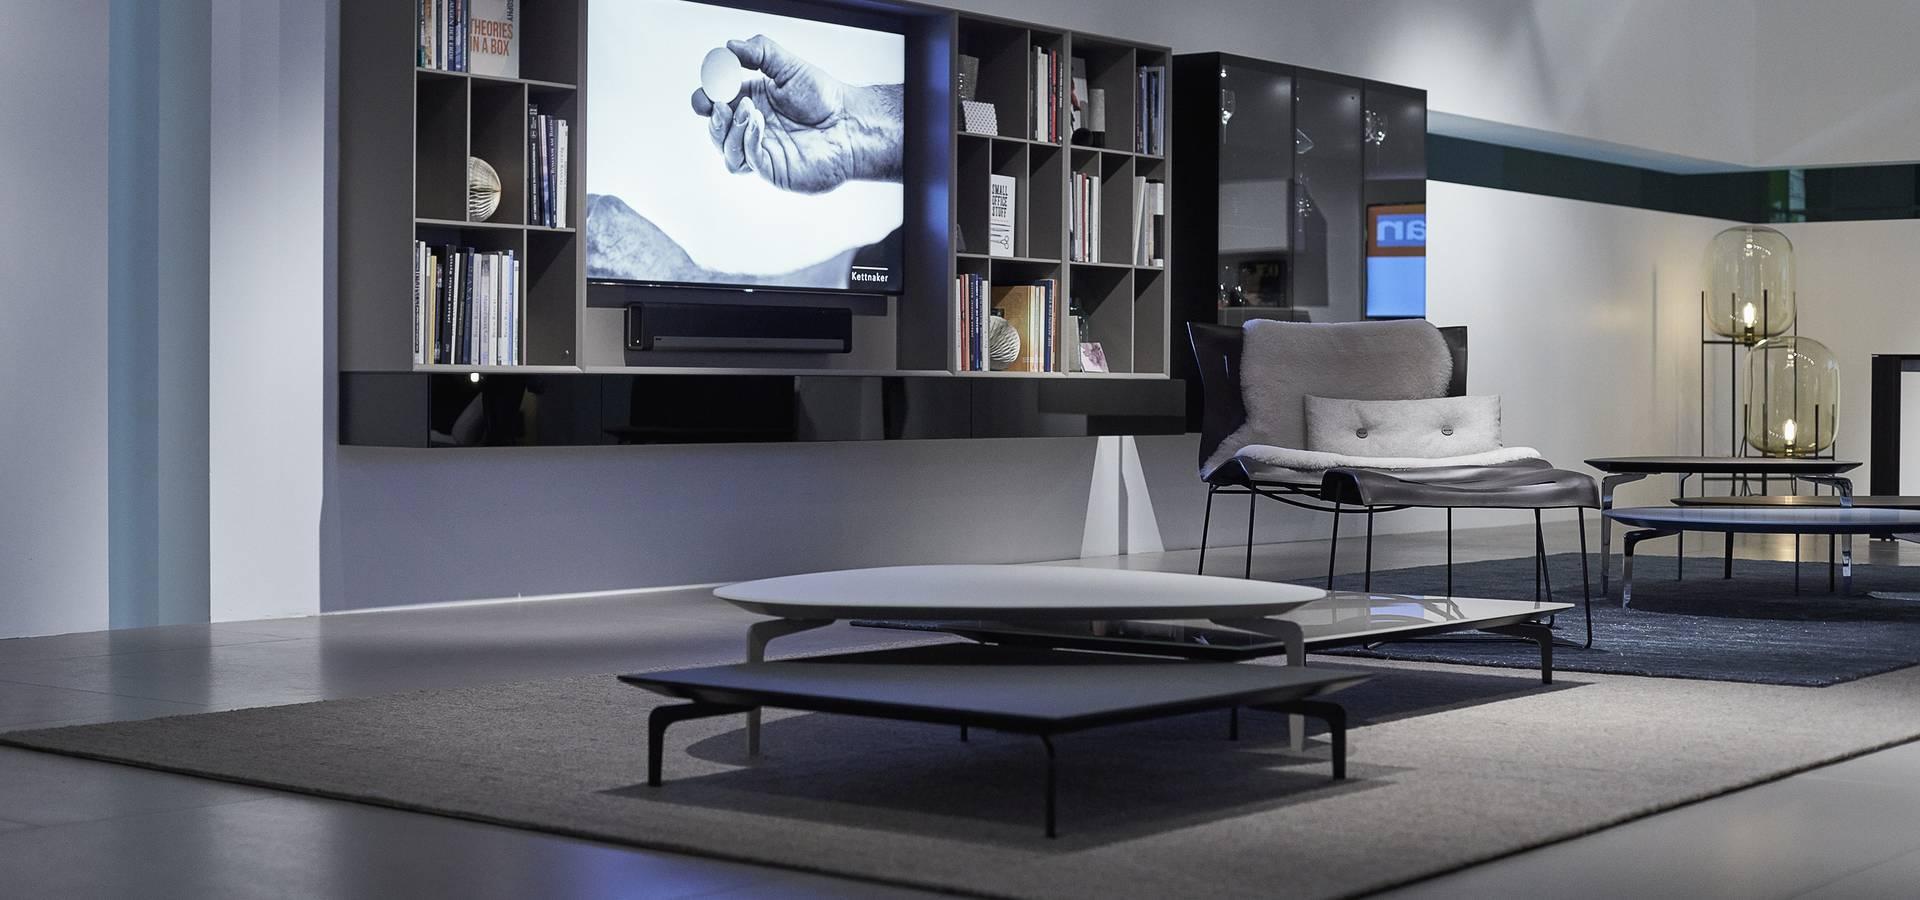 rolf benz haus dresden von avelis gmbh co kg homify. Black Bedroom Furniture Sets. Home Design Ideas